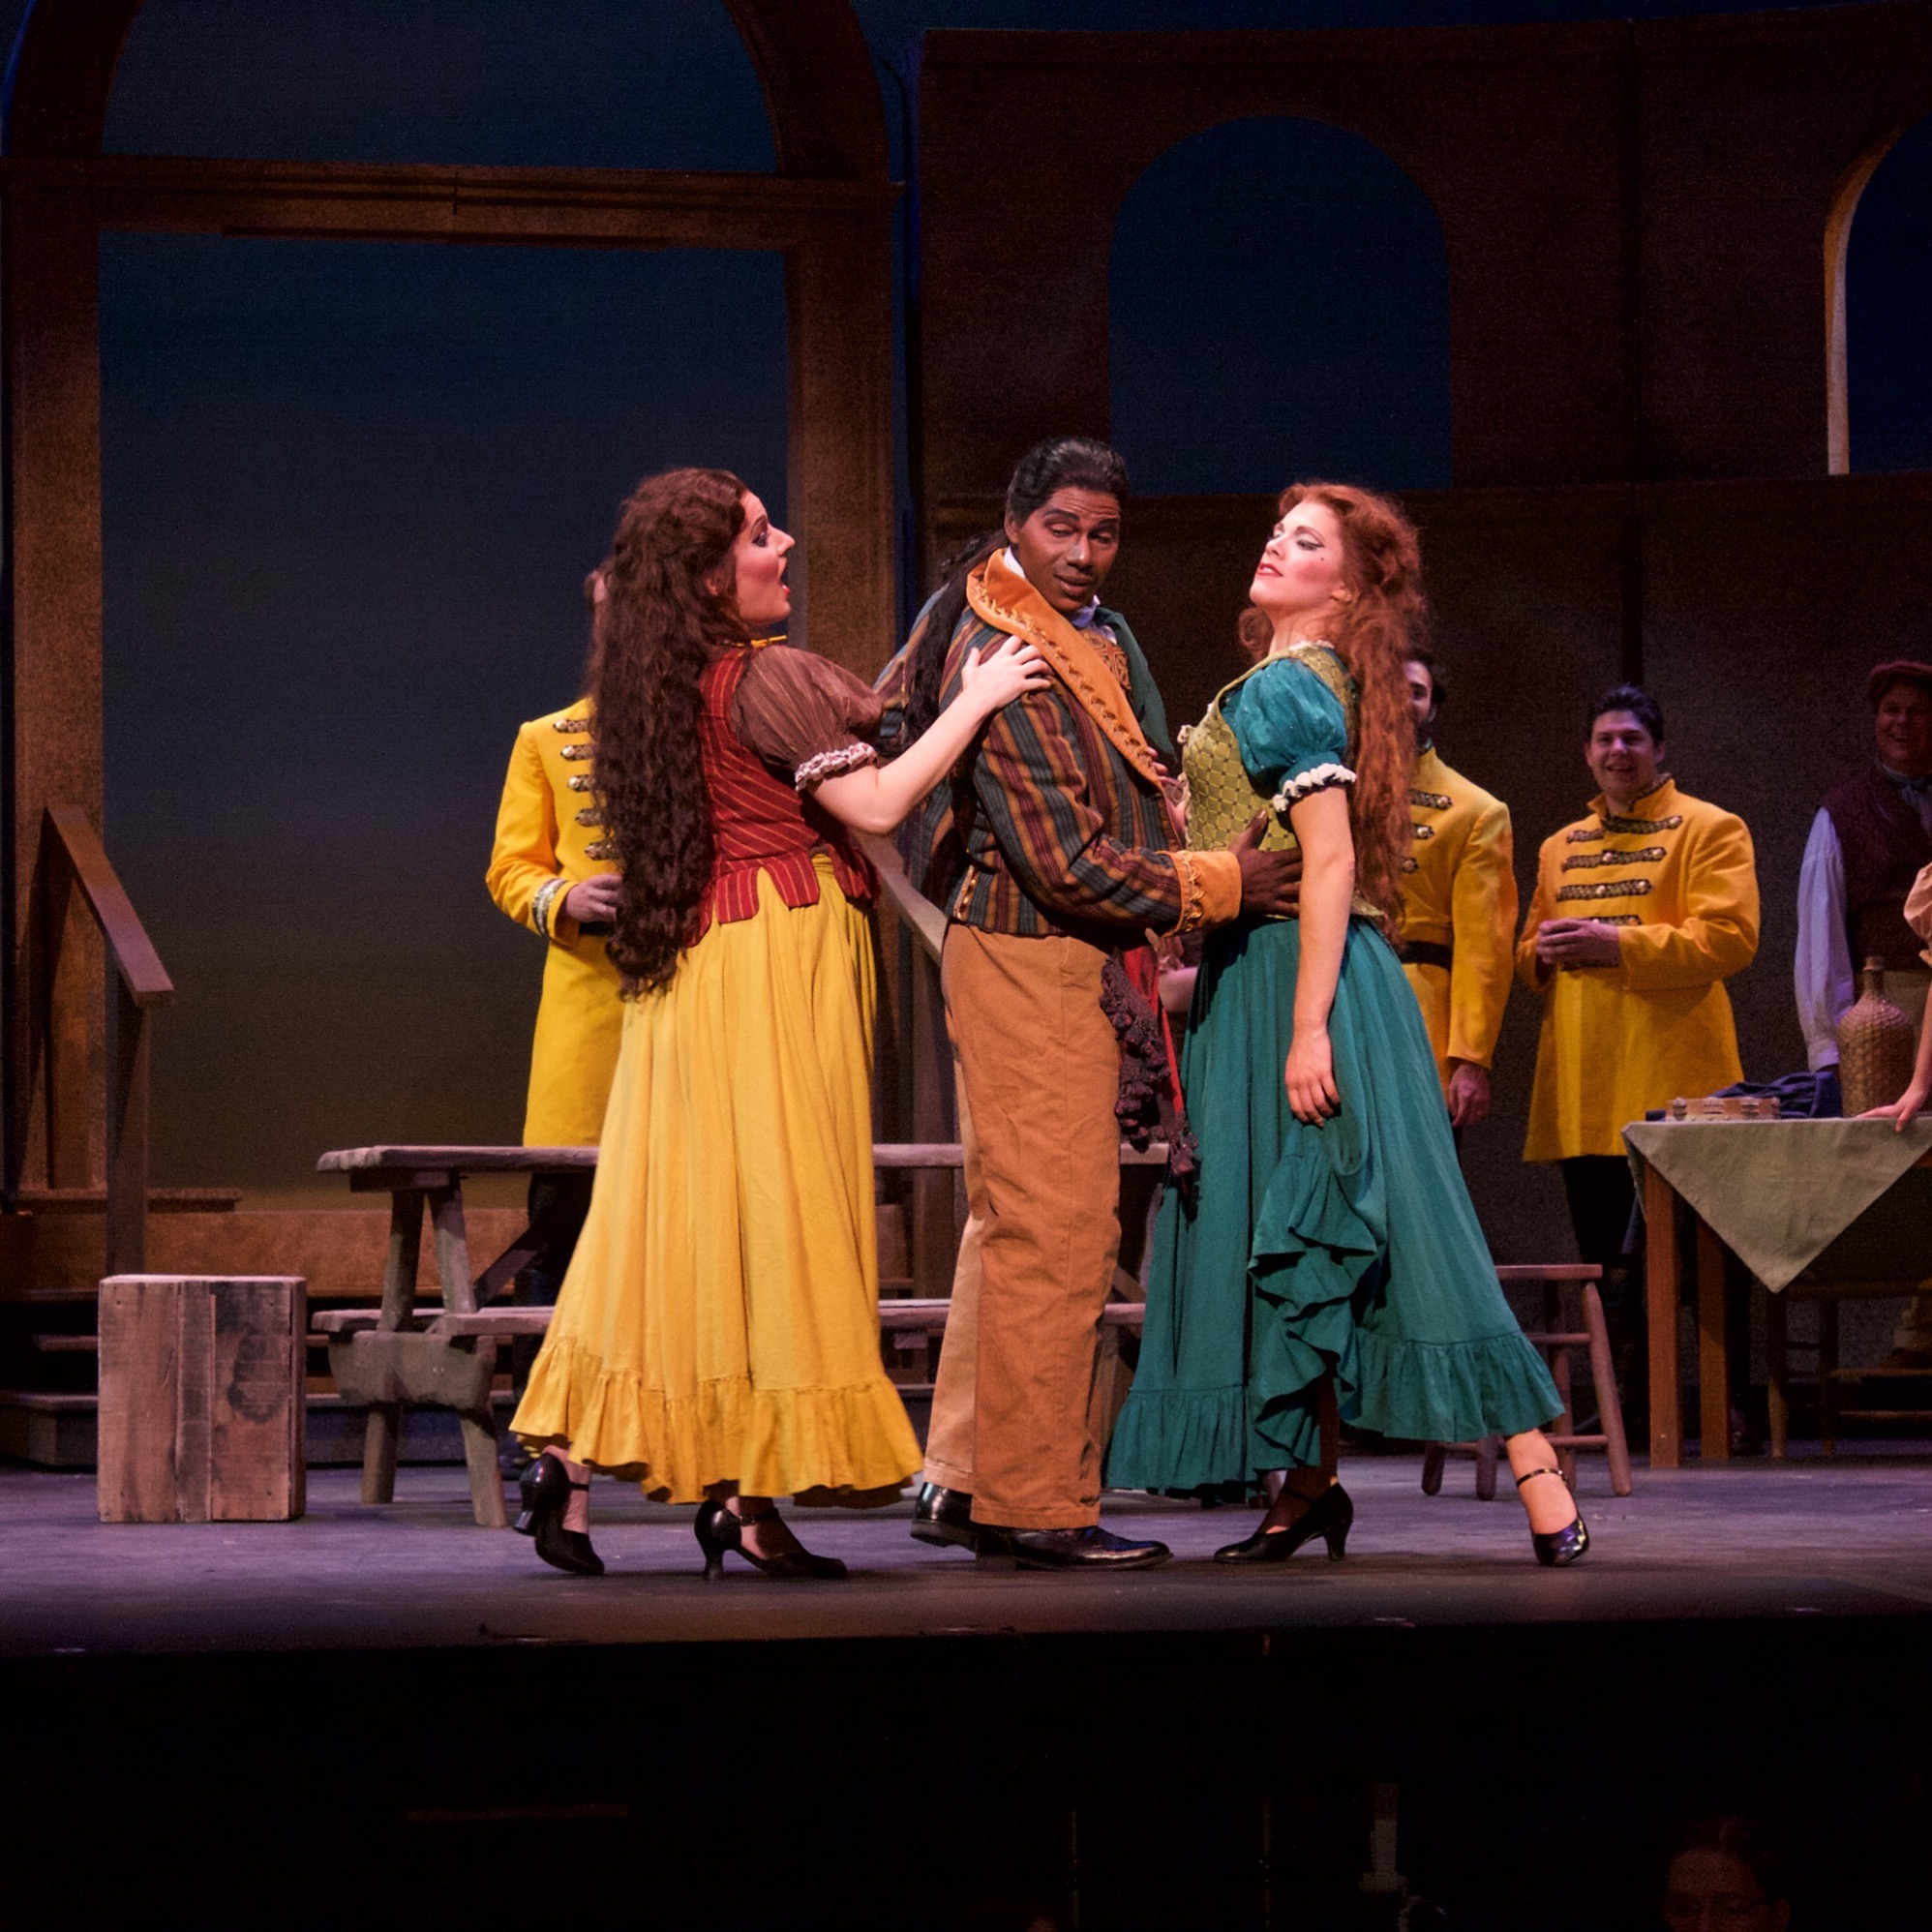 Frasquita,  Carmen,  Opera on the James, 2015